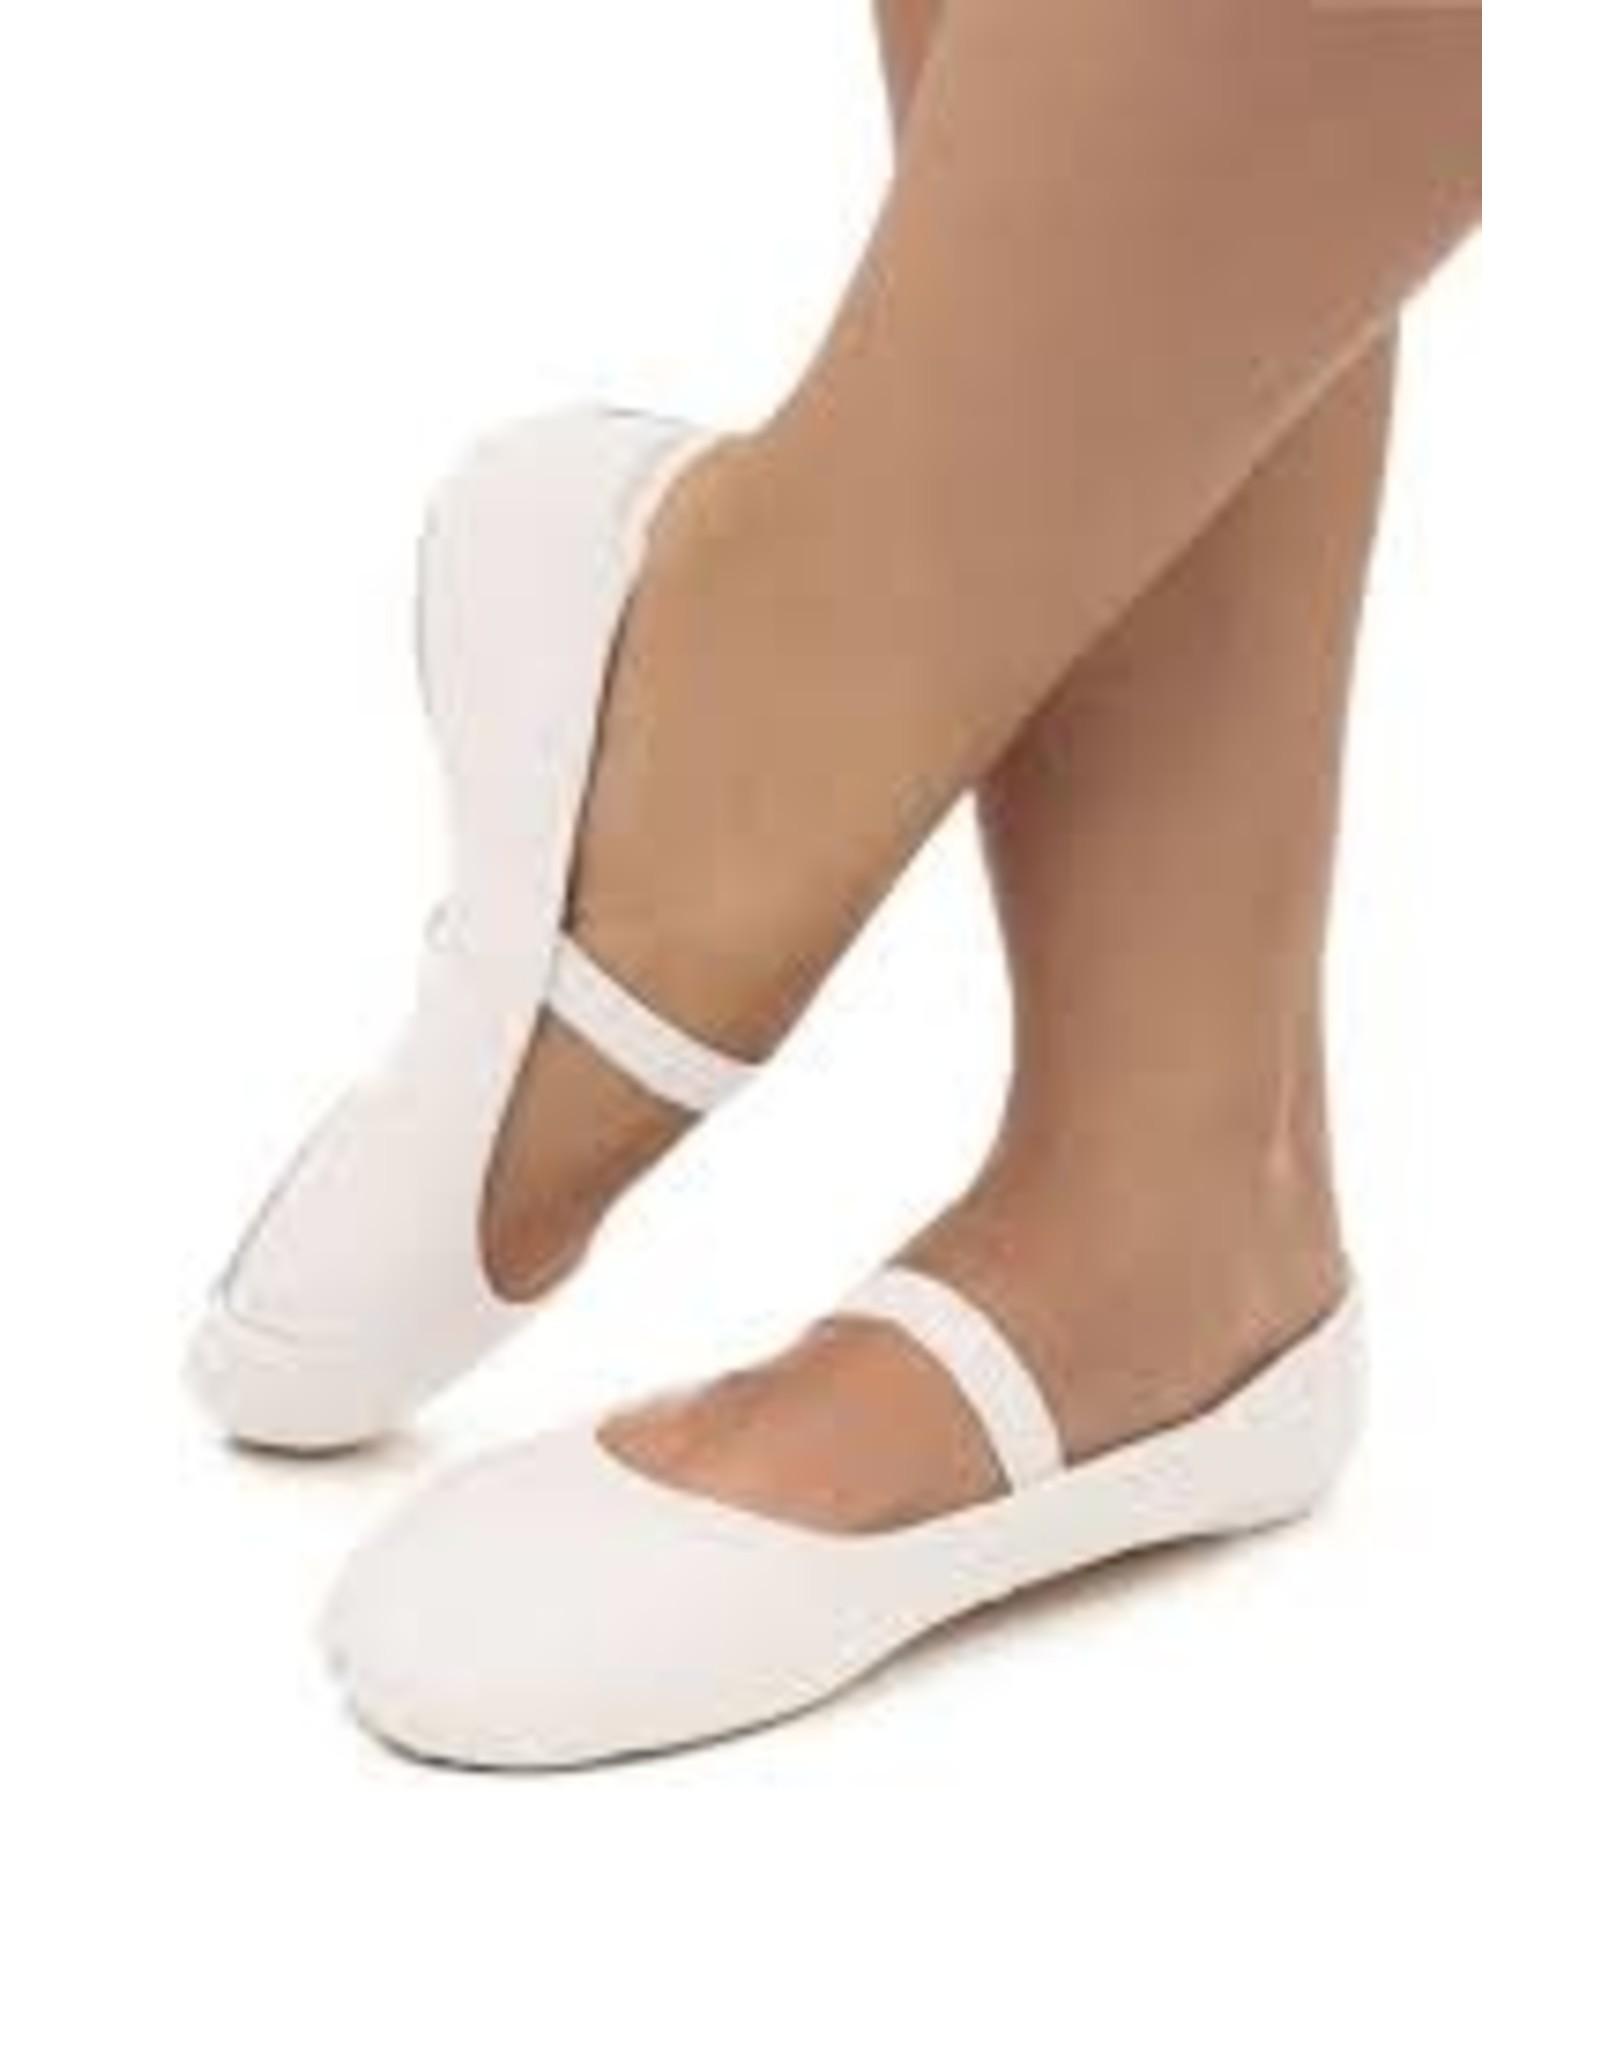 SoDanća SD55S Full Sole Leather Ballet Shoe W/O drawstring WHITE